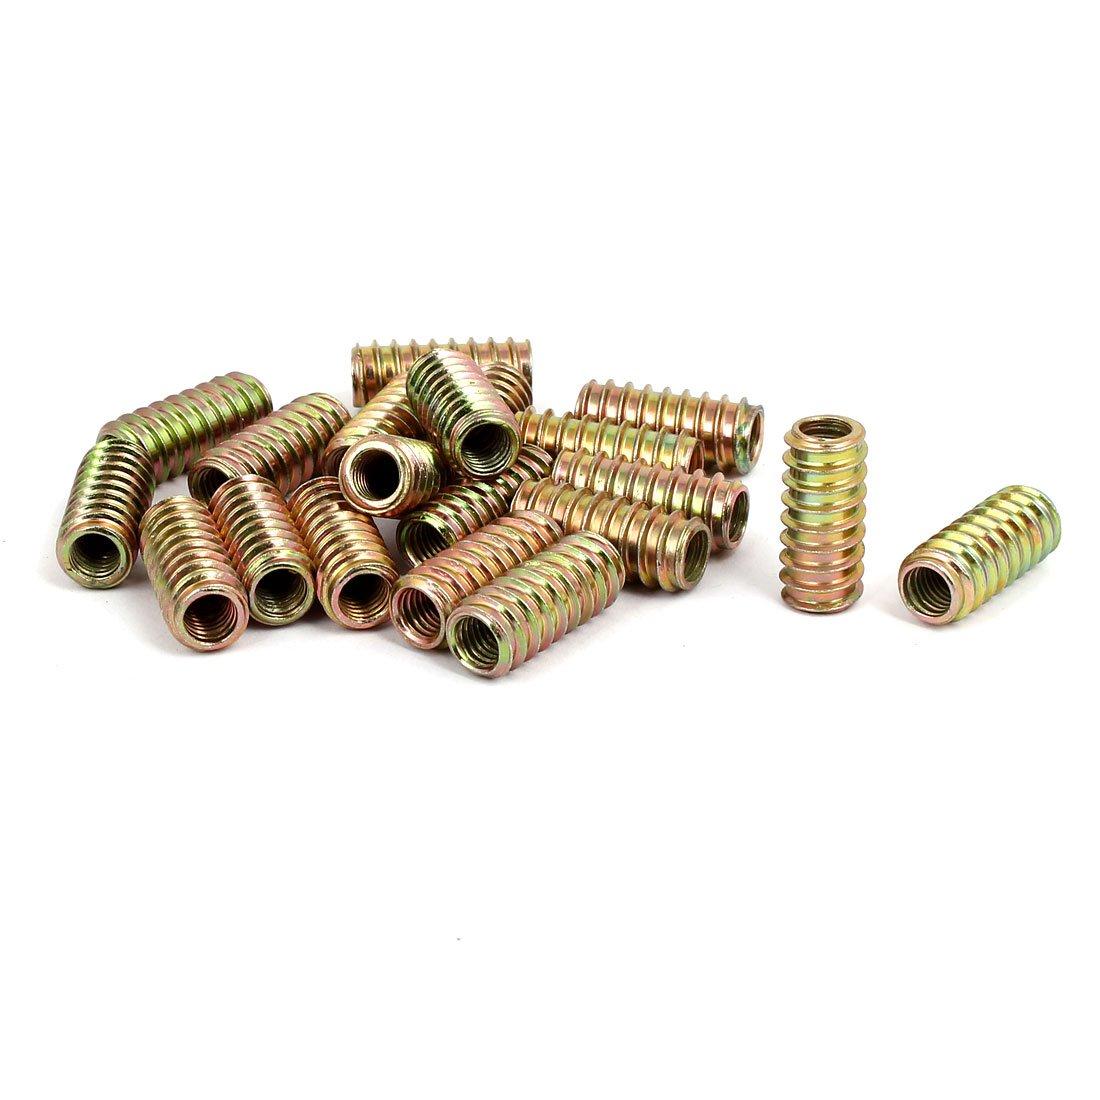 uxcell Wood Furniture Fixing M8x30mm Threaded Insert Nut E-Nut Bronze Tone 20pcs